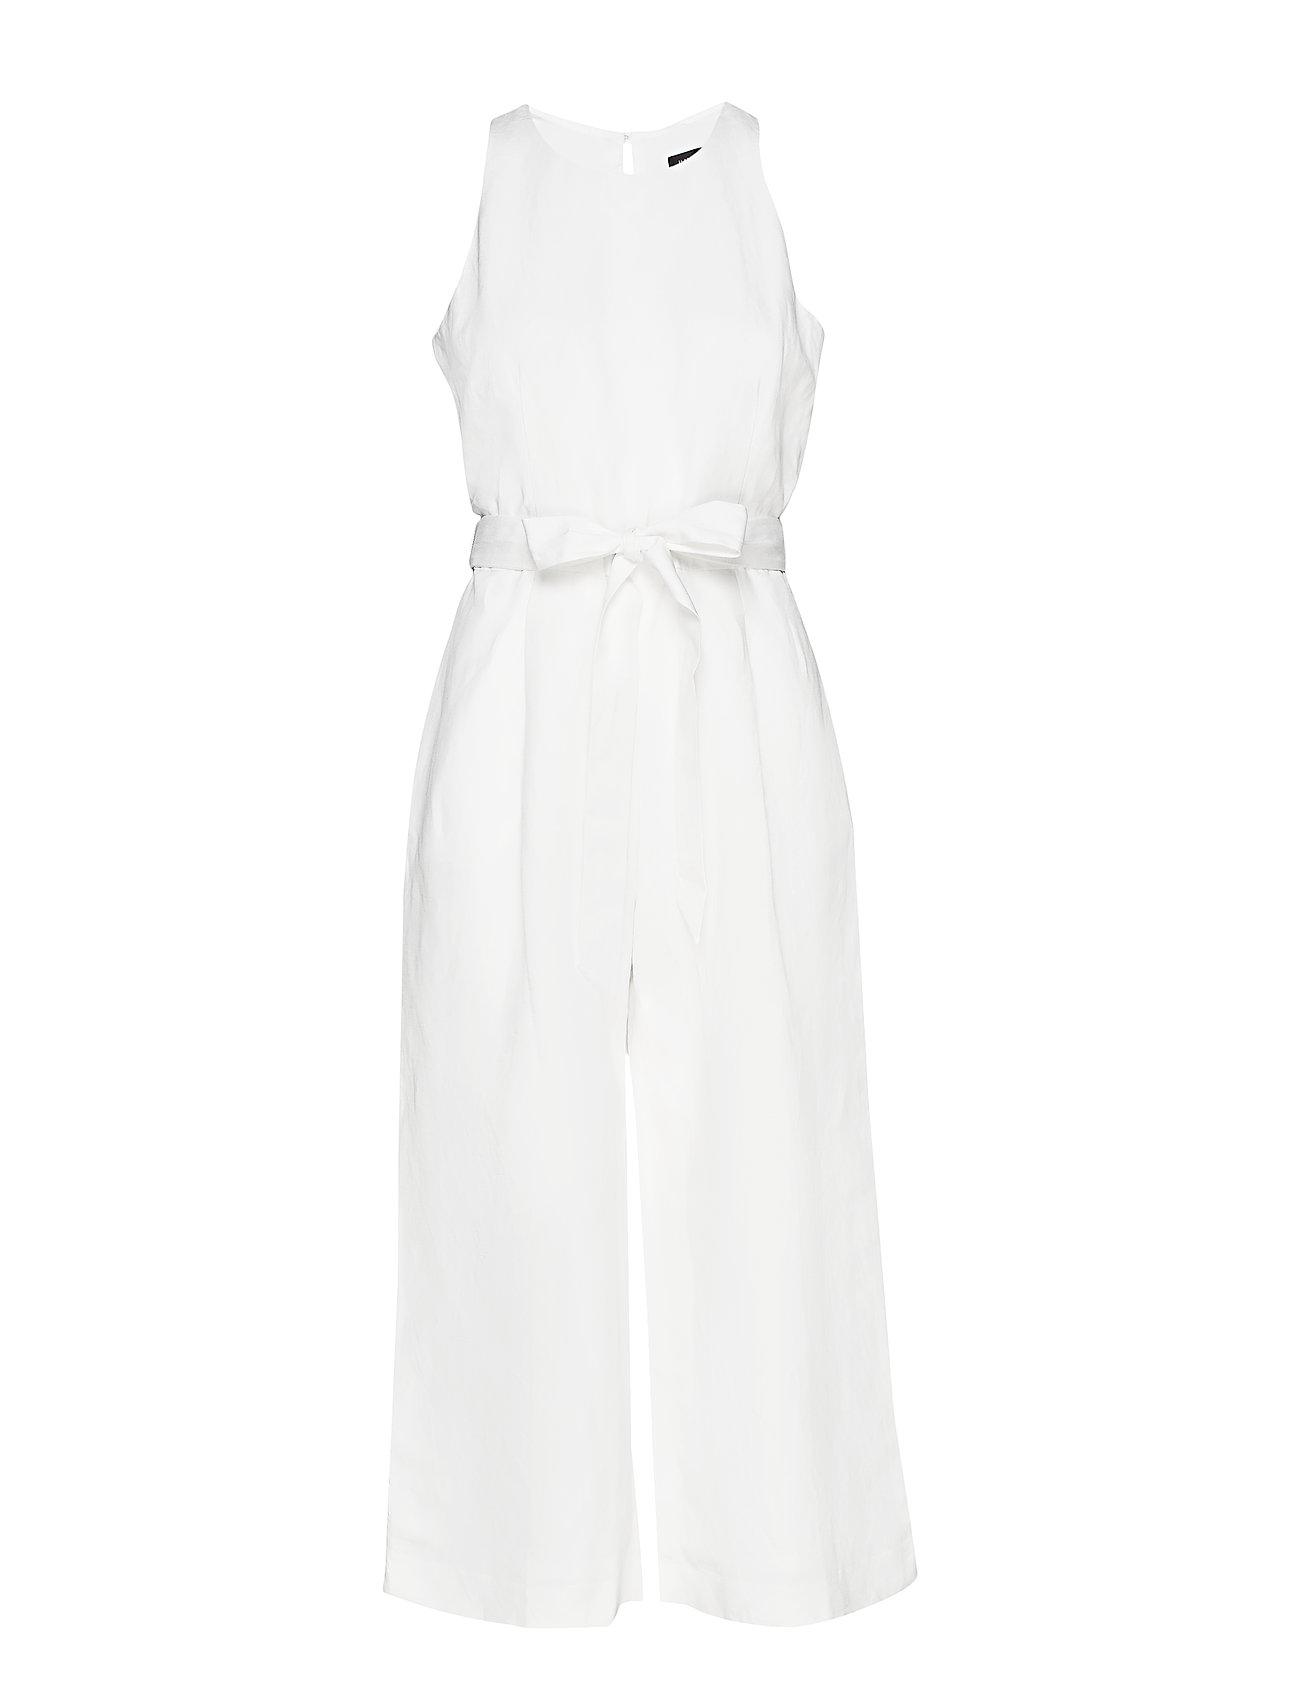 Image of Sl Cropped Linen Belted Jumpsuit Jumpsuit Hvid BANANA REPUBLIC (3185583871)